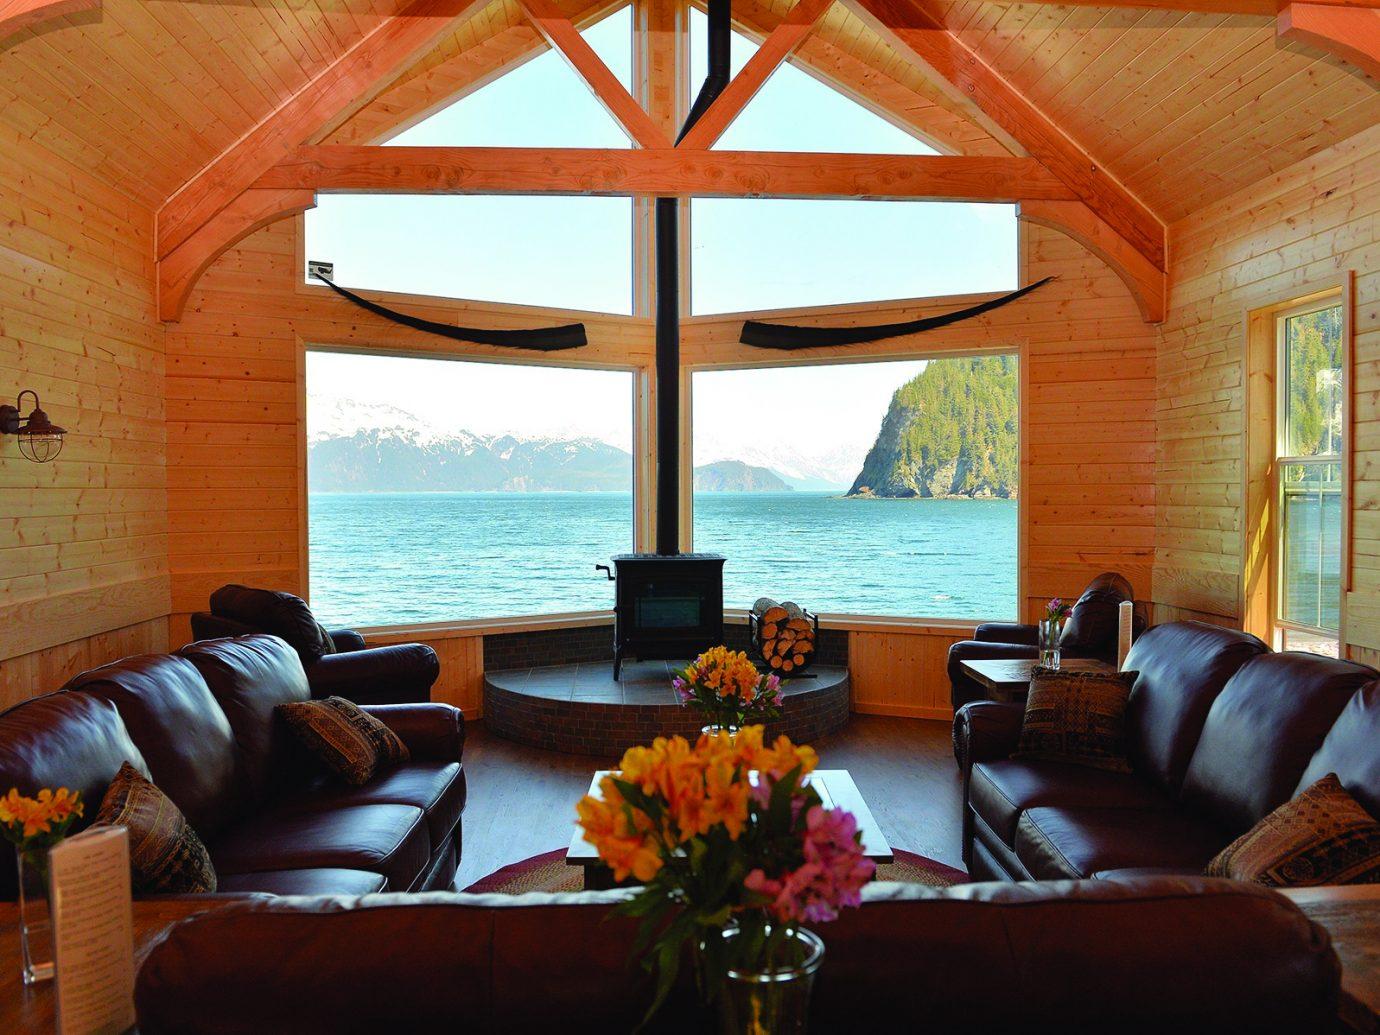 Living room at Kenai Fjords Wilderness Lodge, Alaska